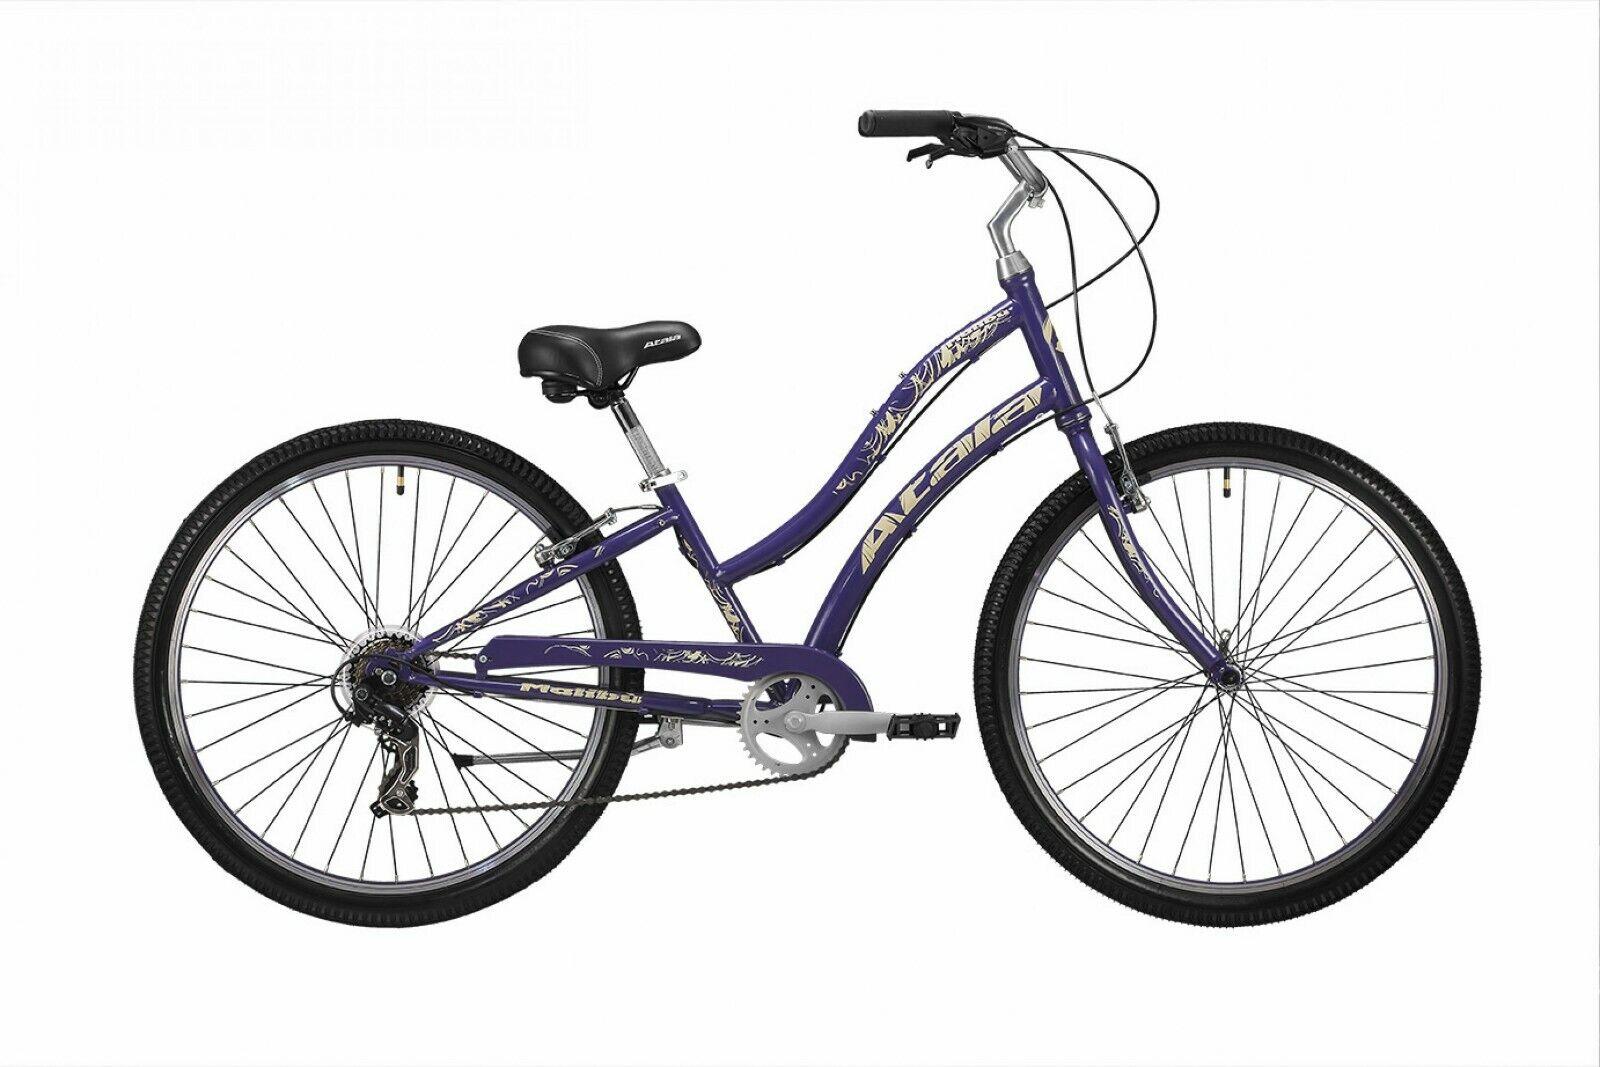 BICYCLE WOMEN'S ATALA MALIBU LADY 7V 27,5  STEEL STRADA shimano